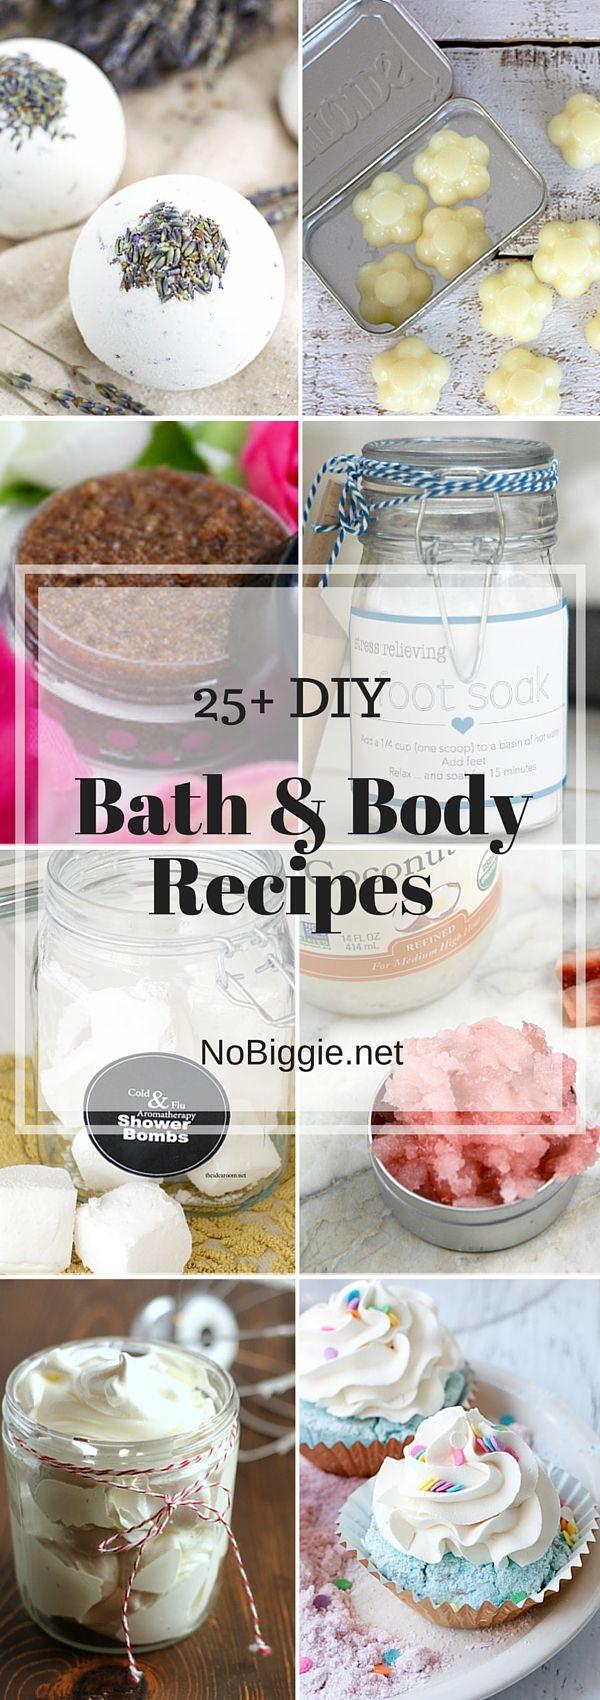 25 Bath